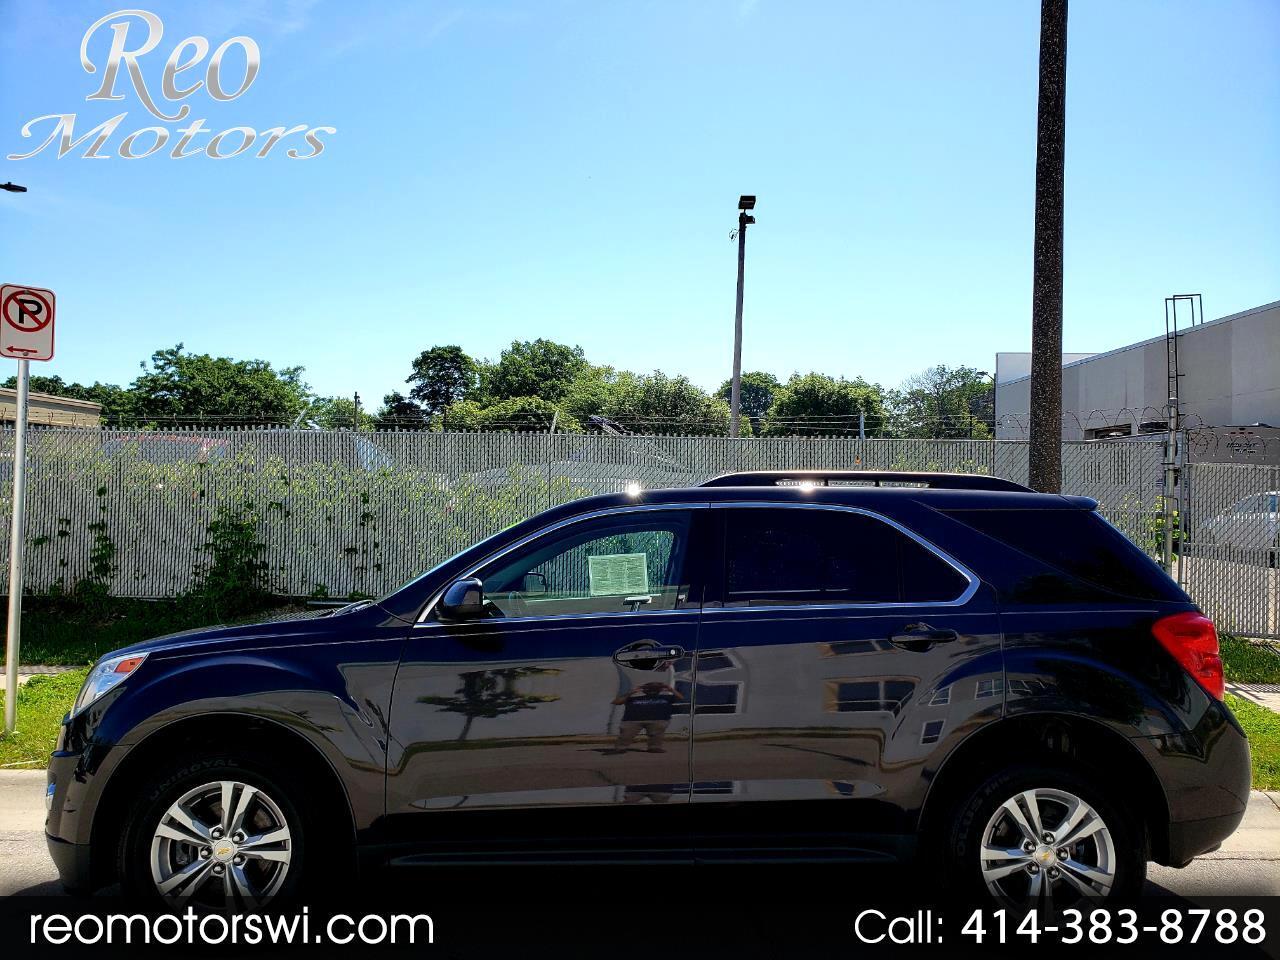 2013 Chevrolet Equinox LT 2WD